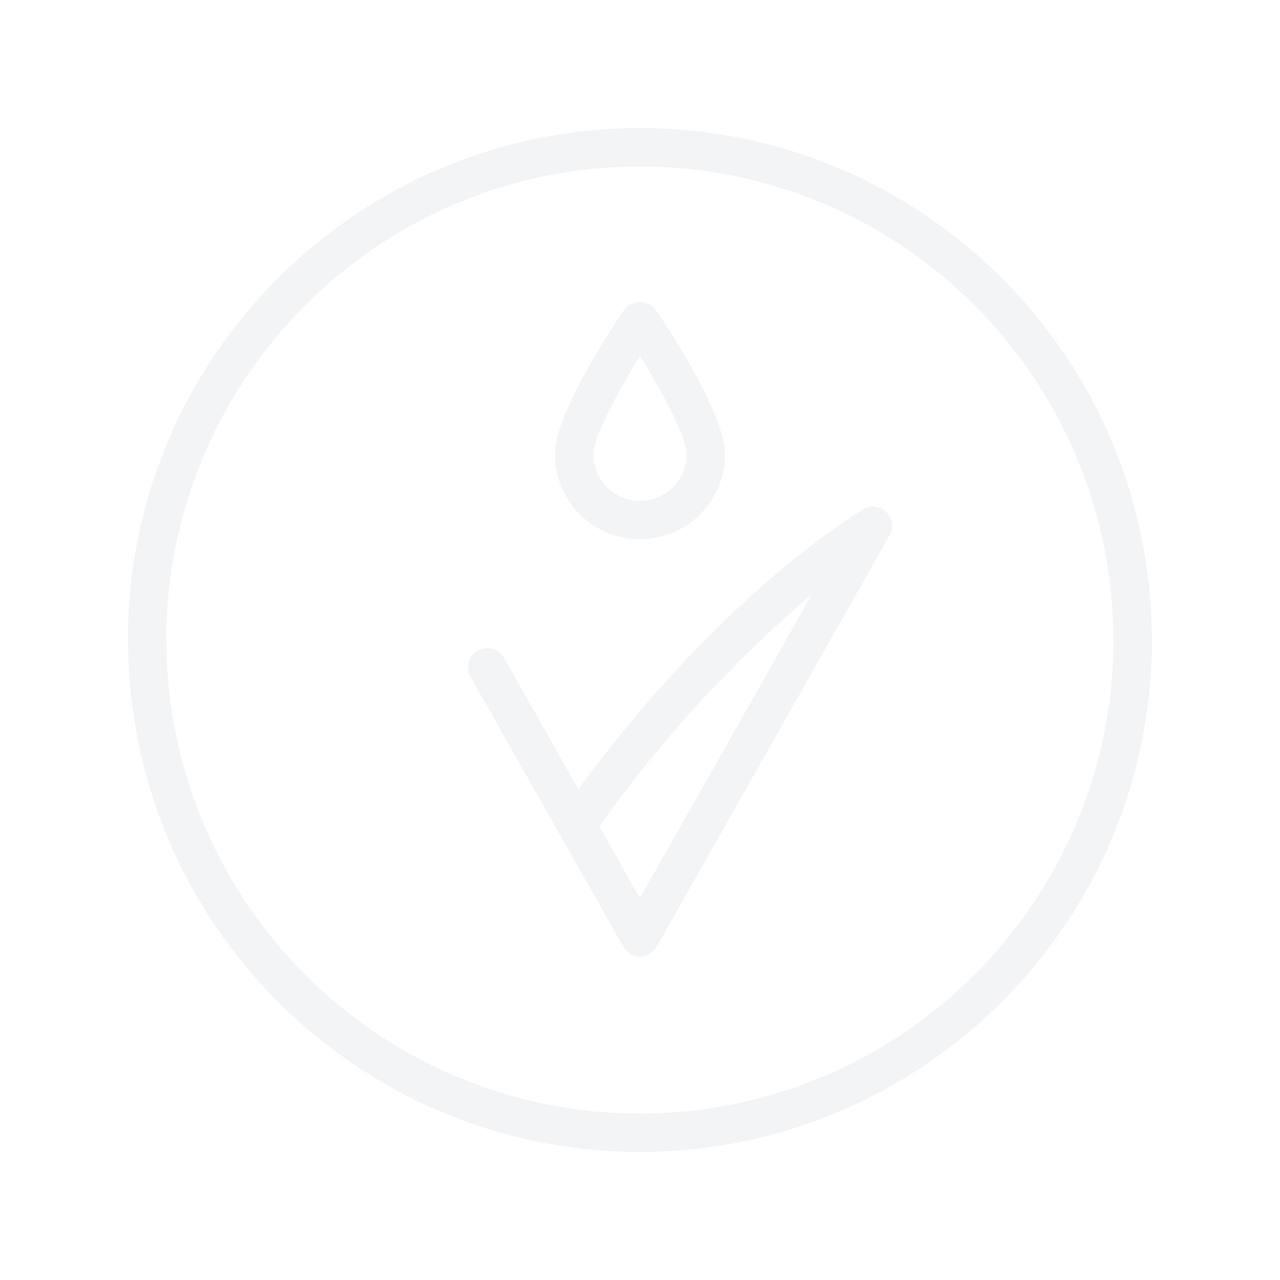 TONYMOLY Pandas Dream Sherbet Cleanser 40g